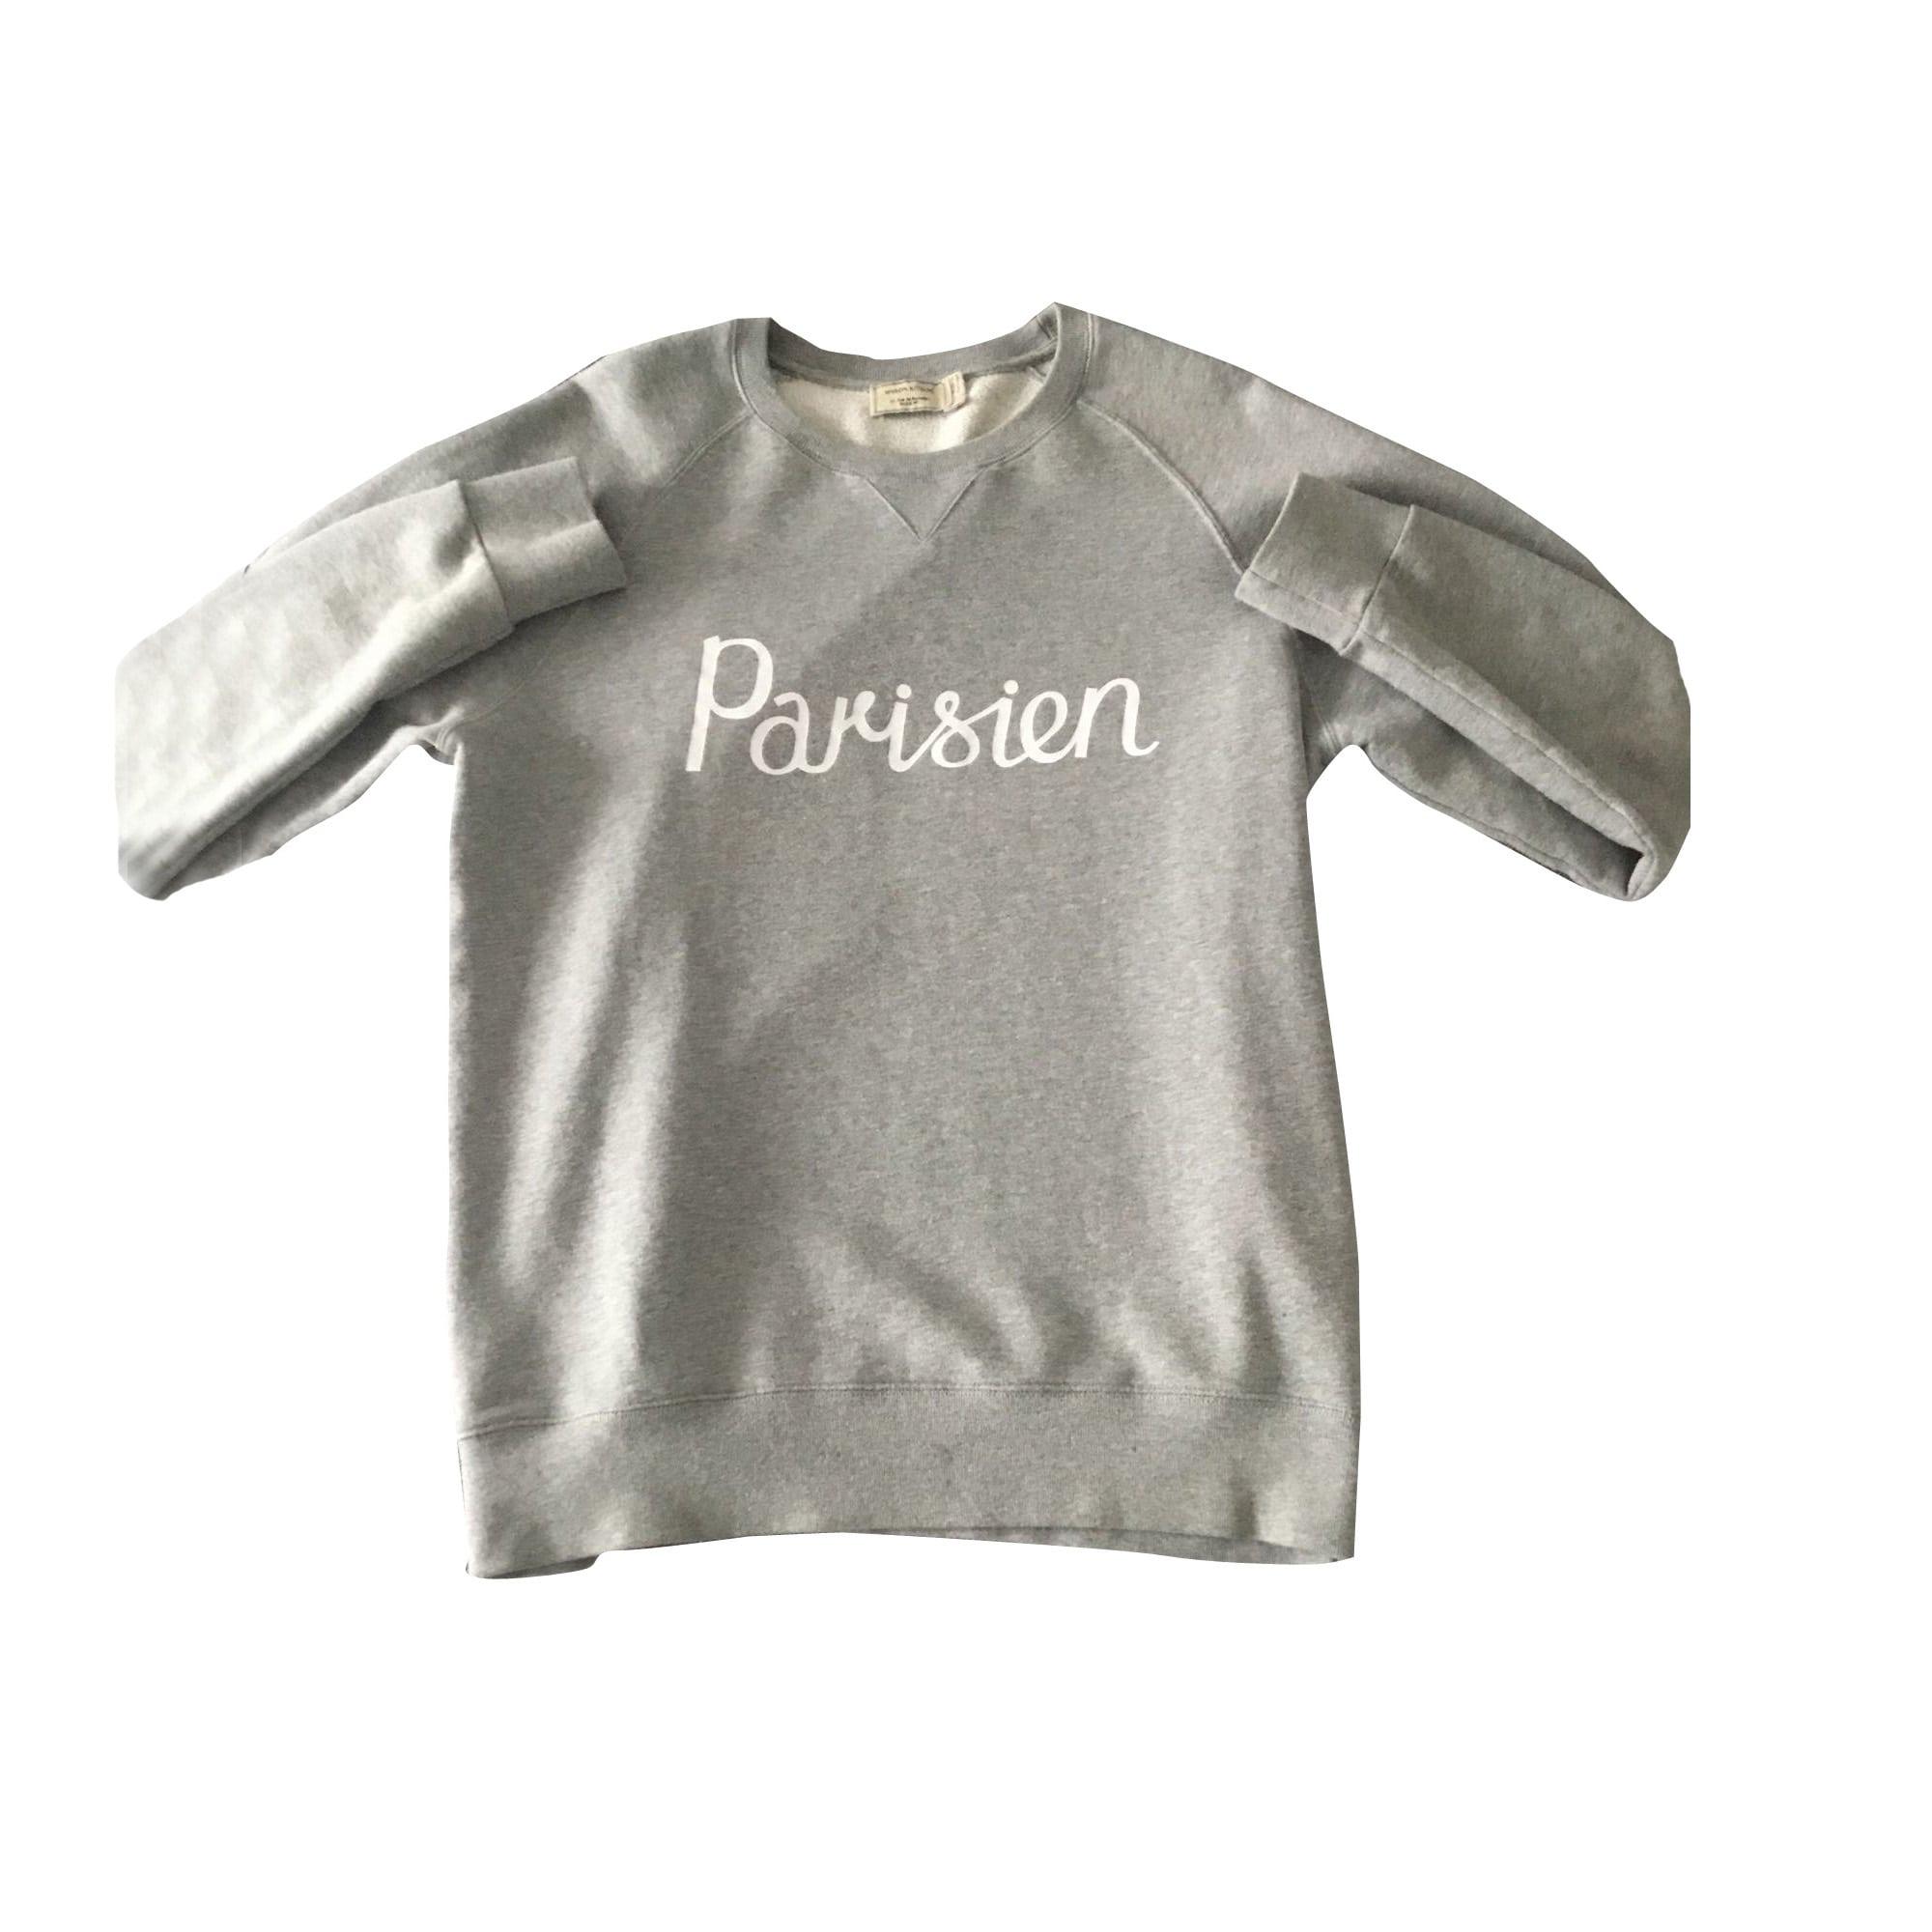 Sweatshirt MAISON KITSUNÉ Gray, charcoal